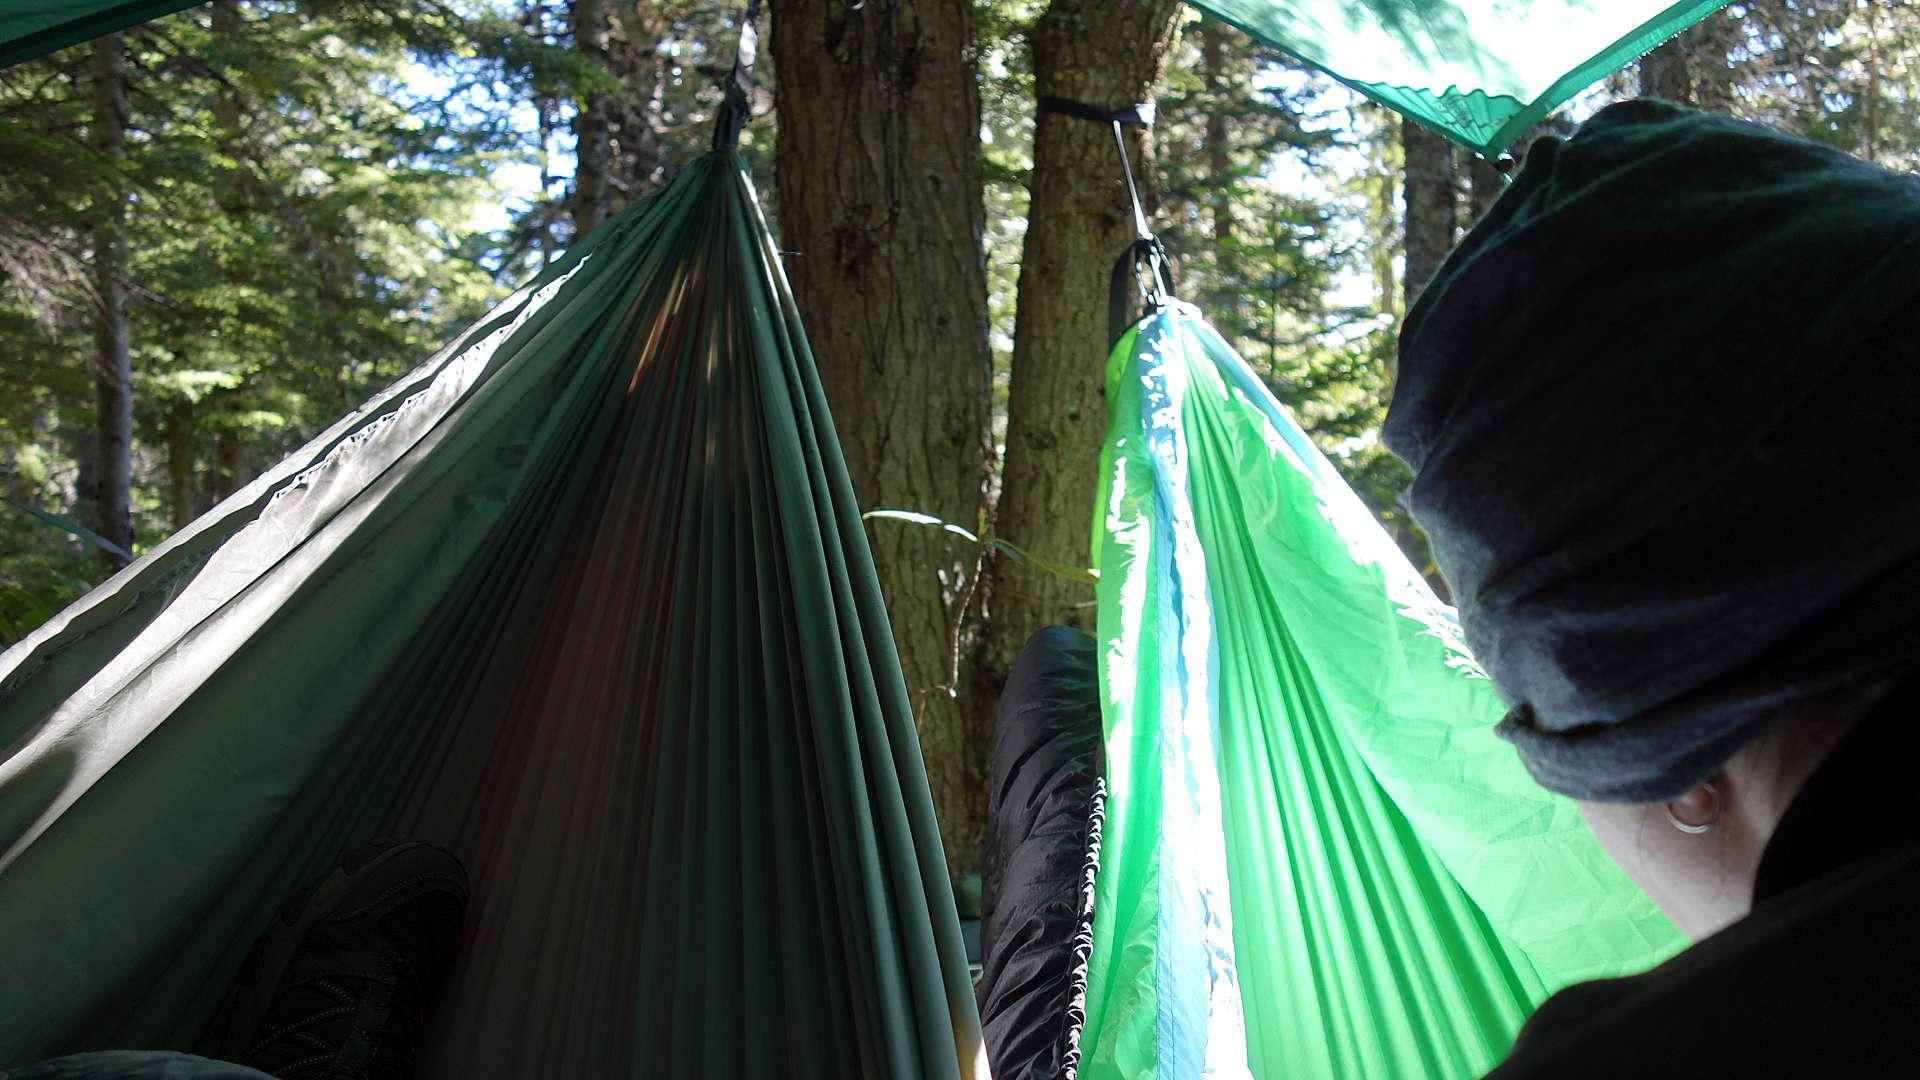 090 Hang The Hammock Camping Episode